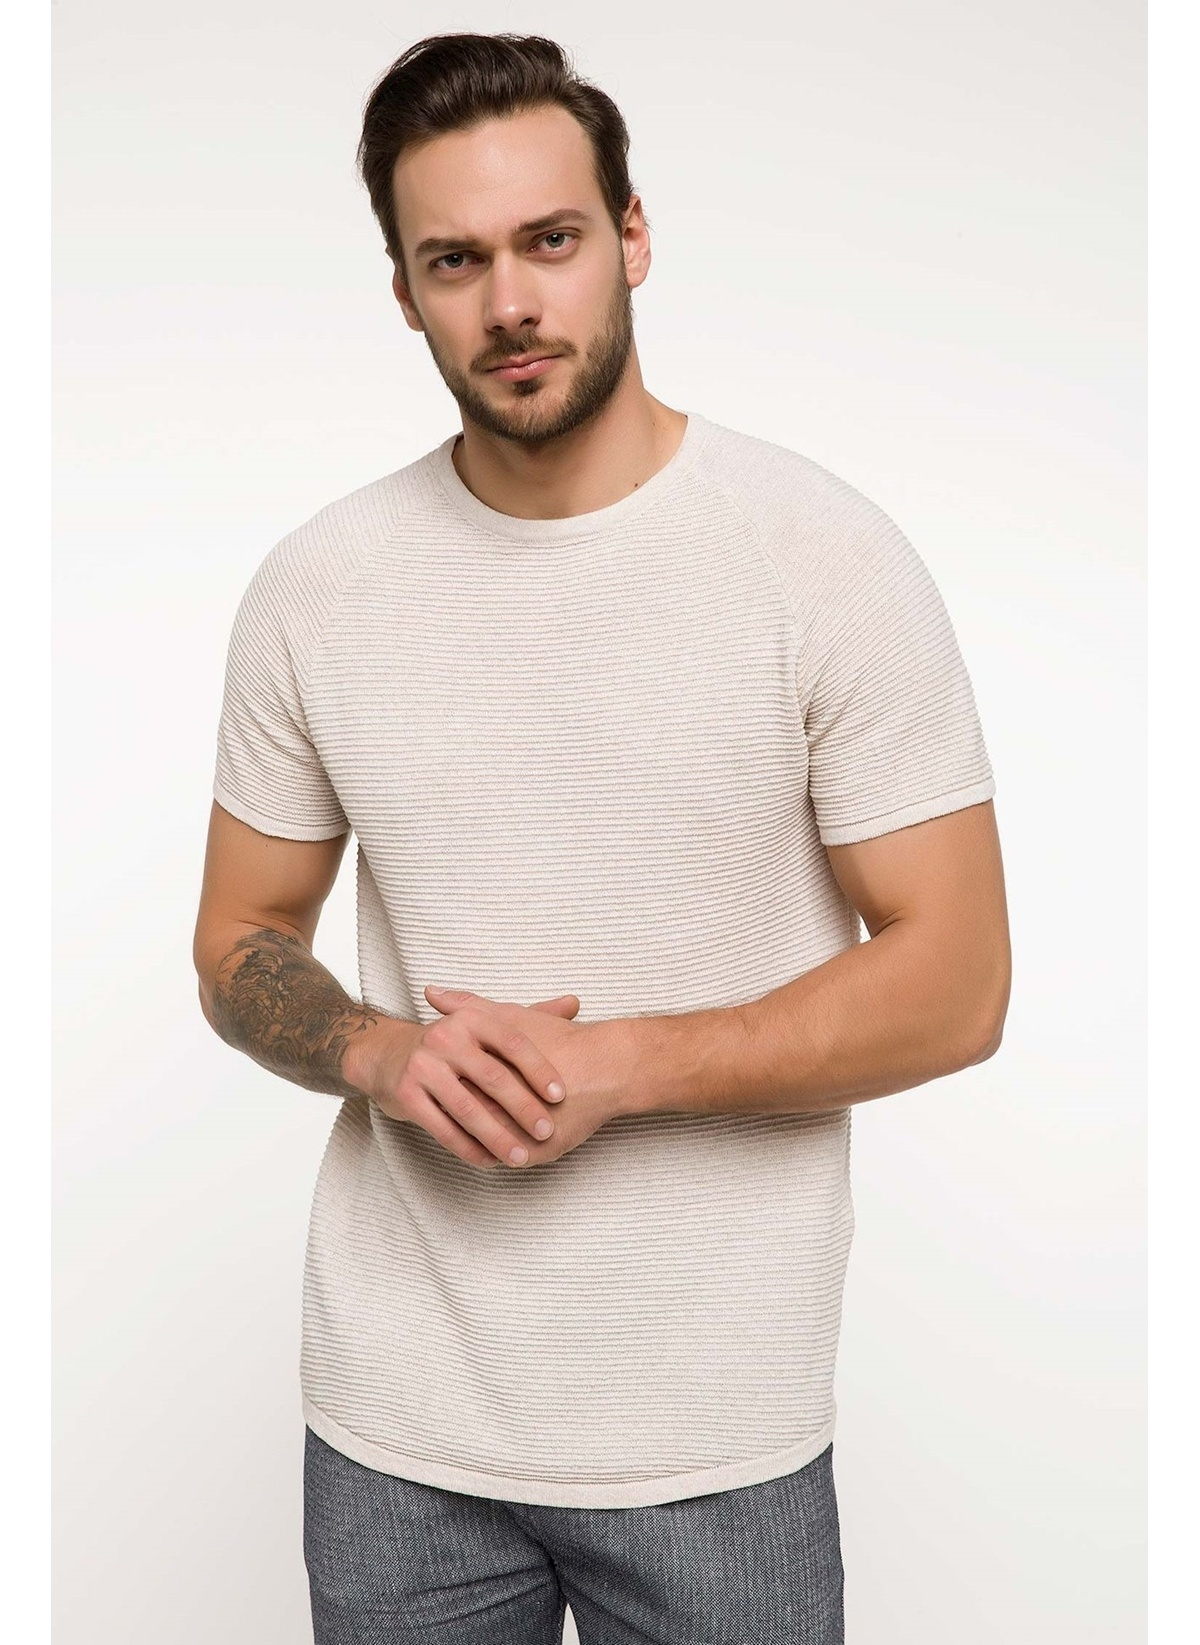 Defacto Sıfır Yaka Slim Fit Triko T-shirt I5900az18smbg216 Kazak – 39.99 TL